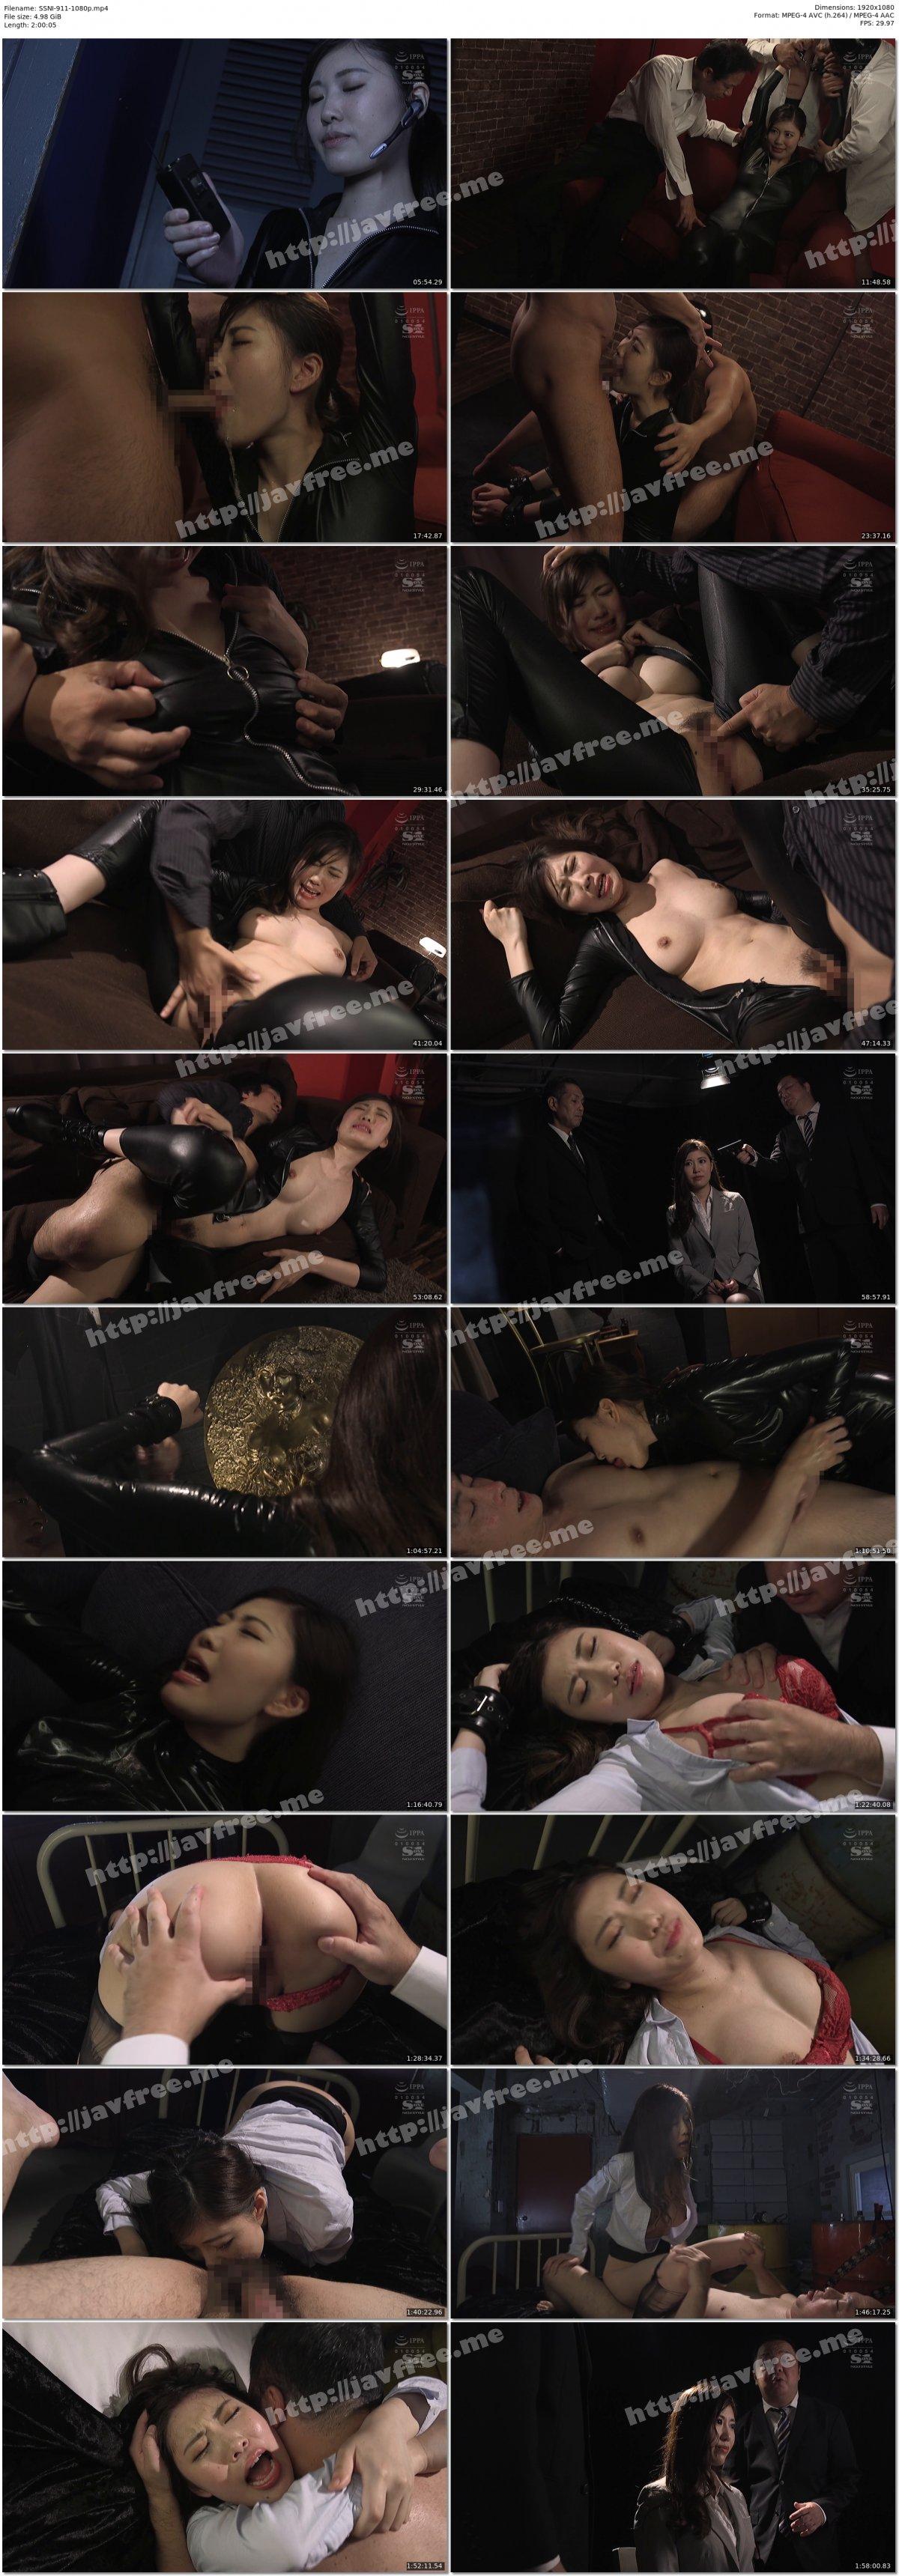 [HD][SSNI-911] エリート捜査官を脱がさずに犯る媚薬漬け性処理女に堕ちた黄金比ボディ 花宮あむ - image SSNI-911-1080p on https://javfree.me